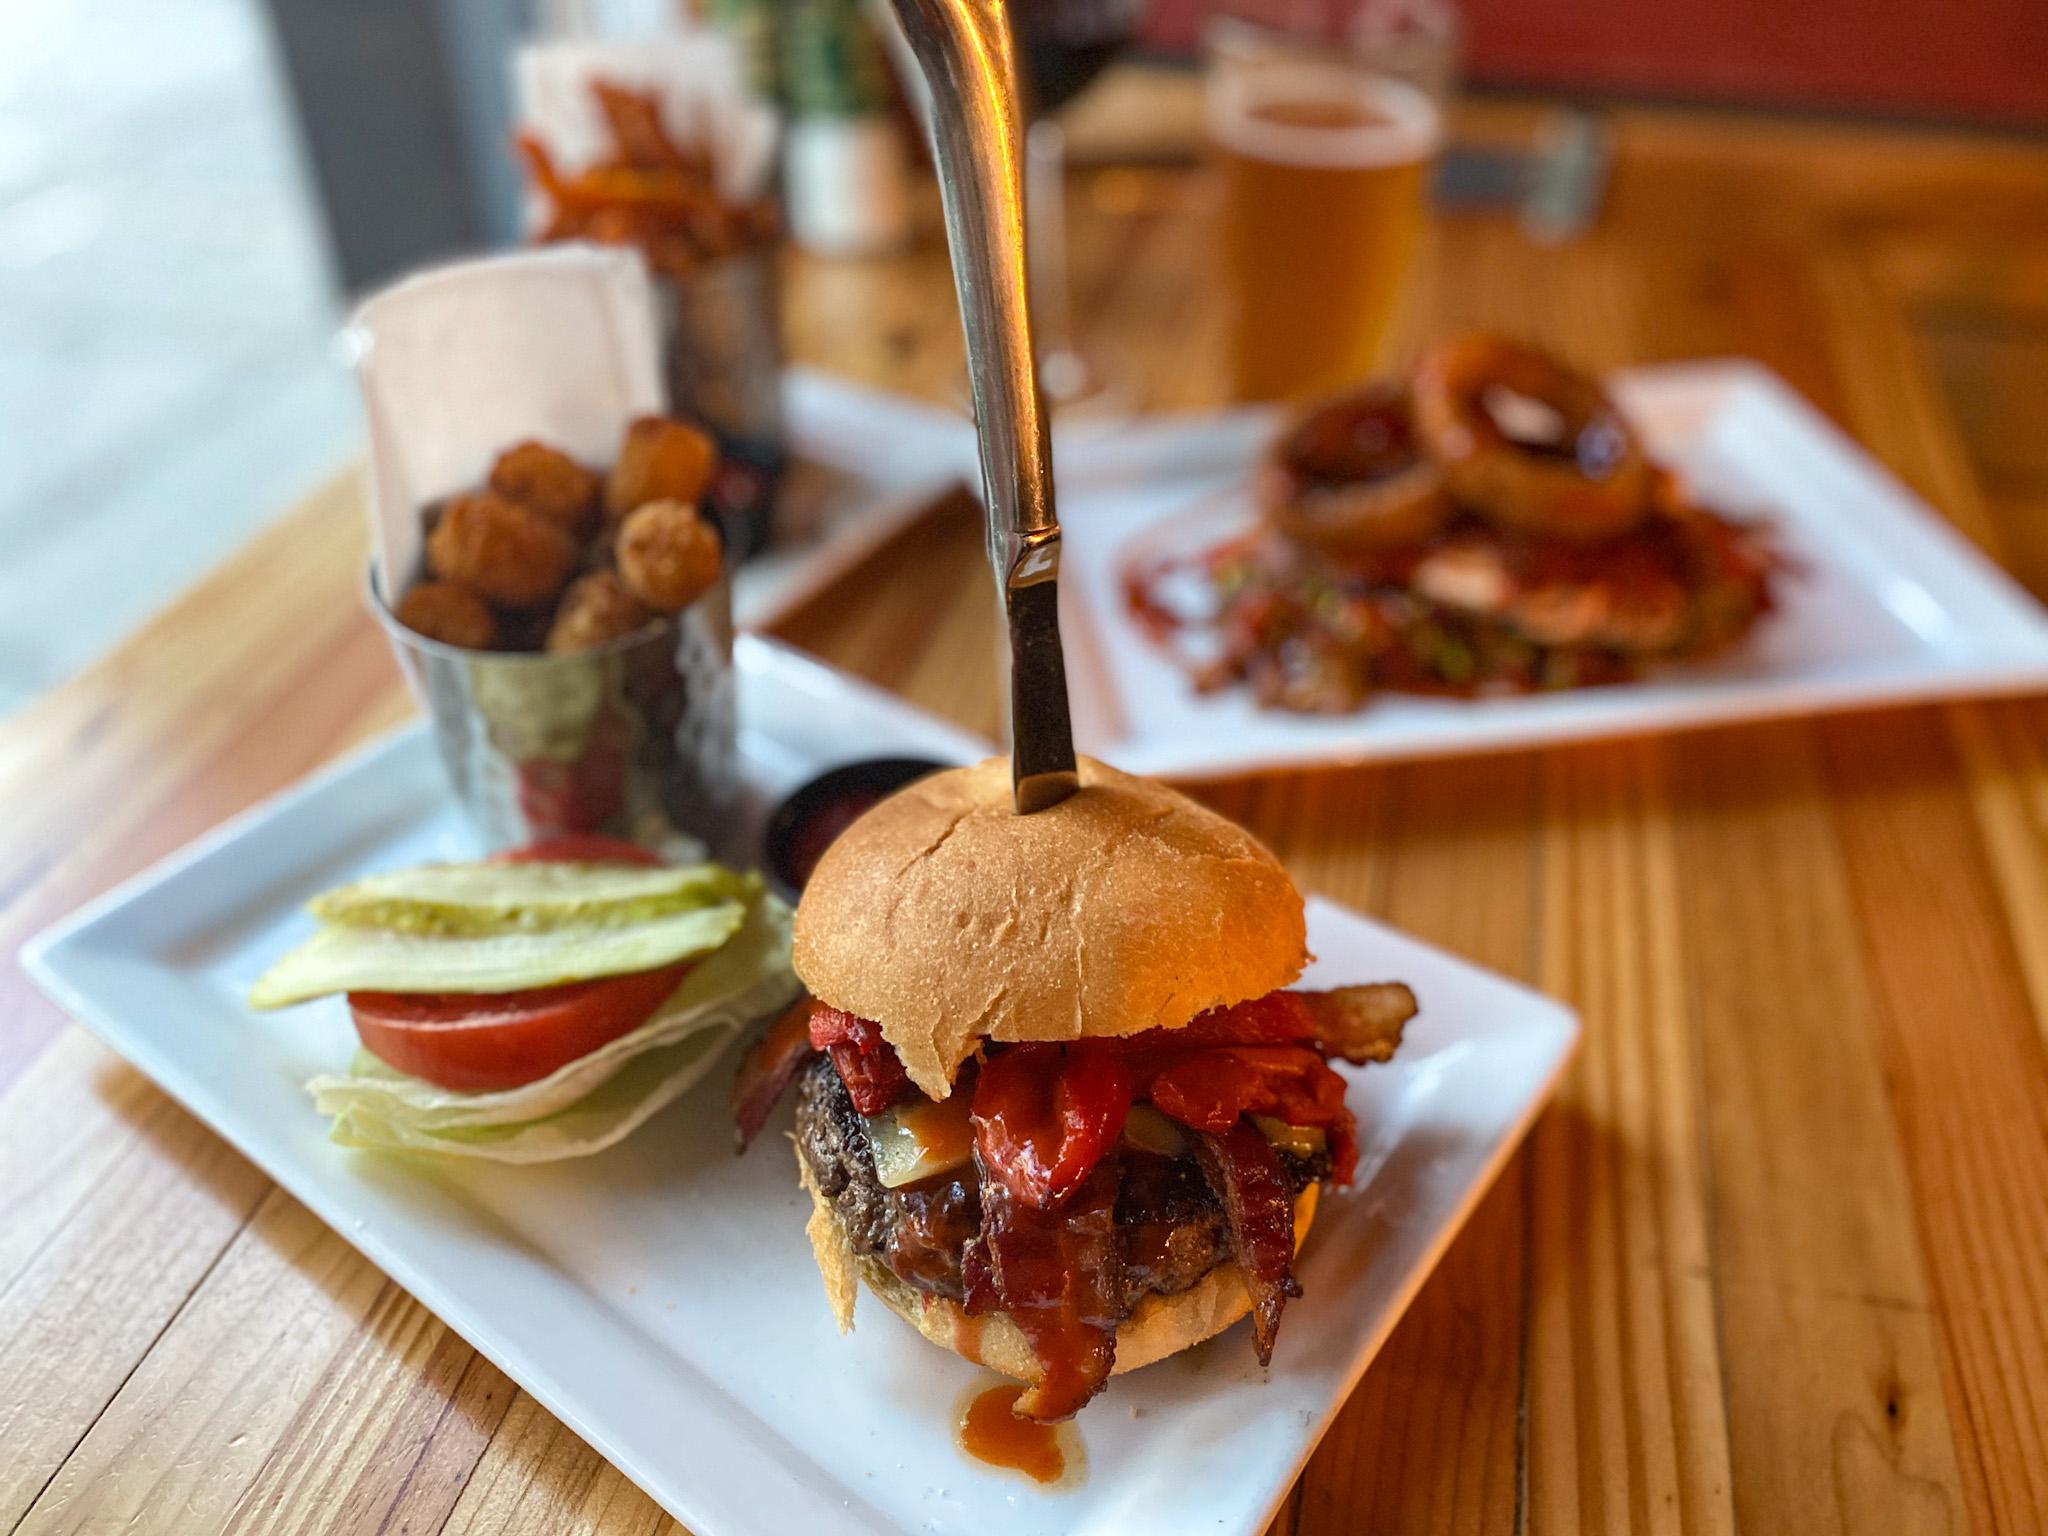 The Black Flag Burger